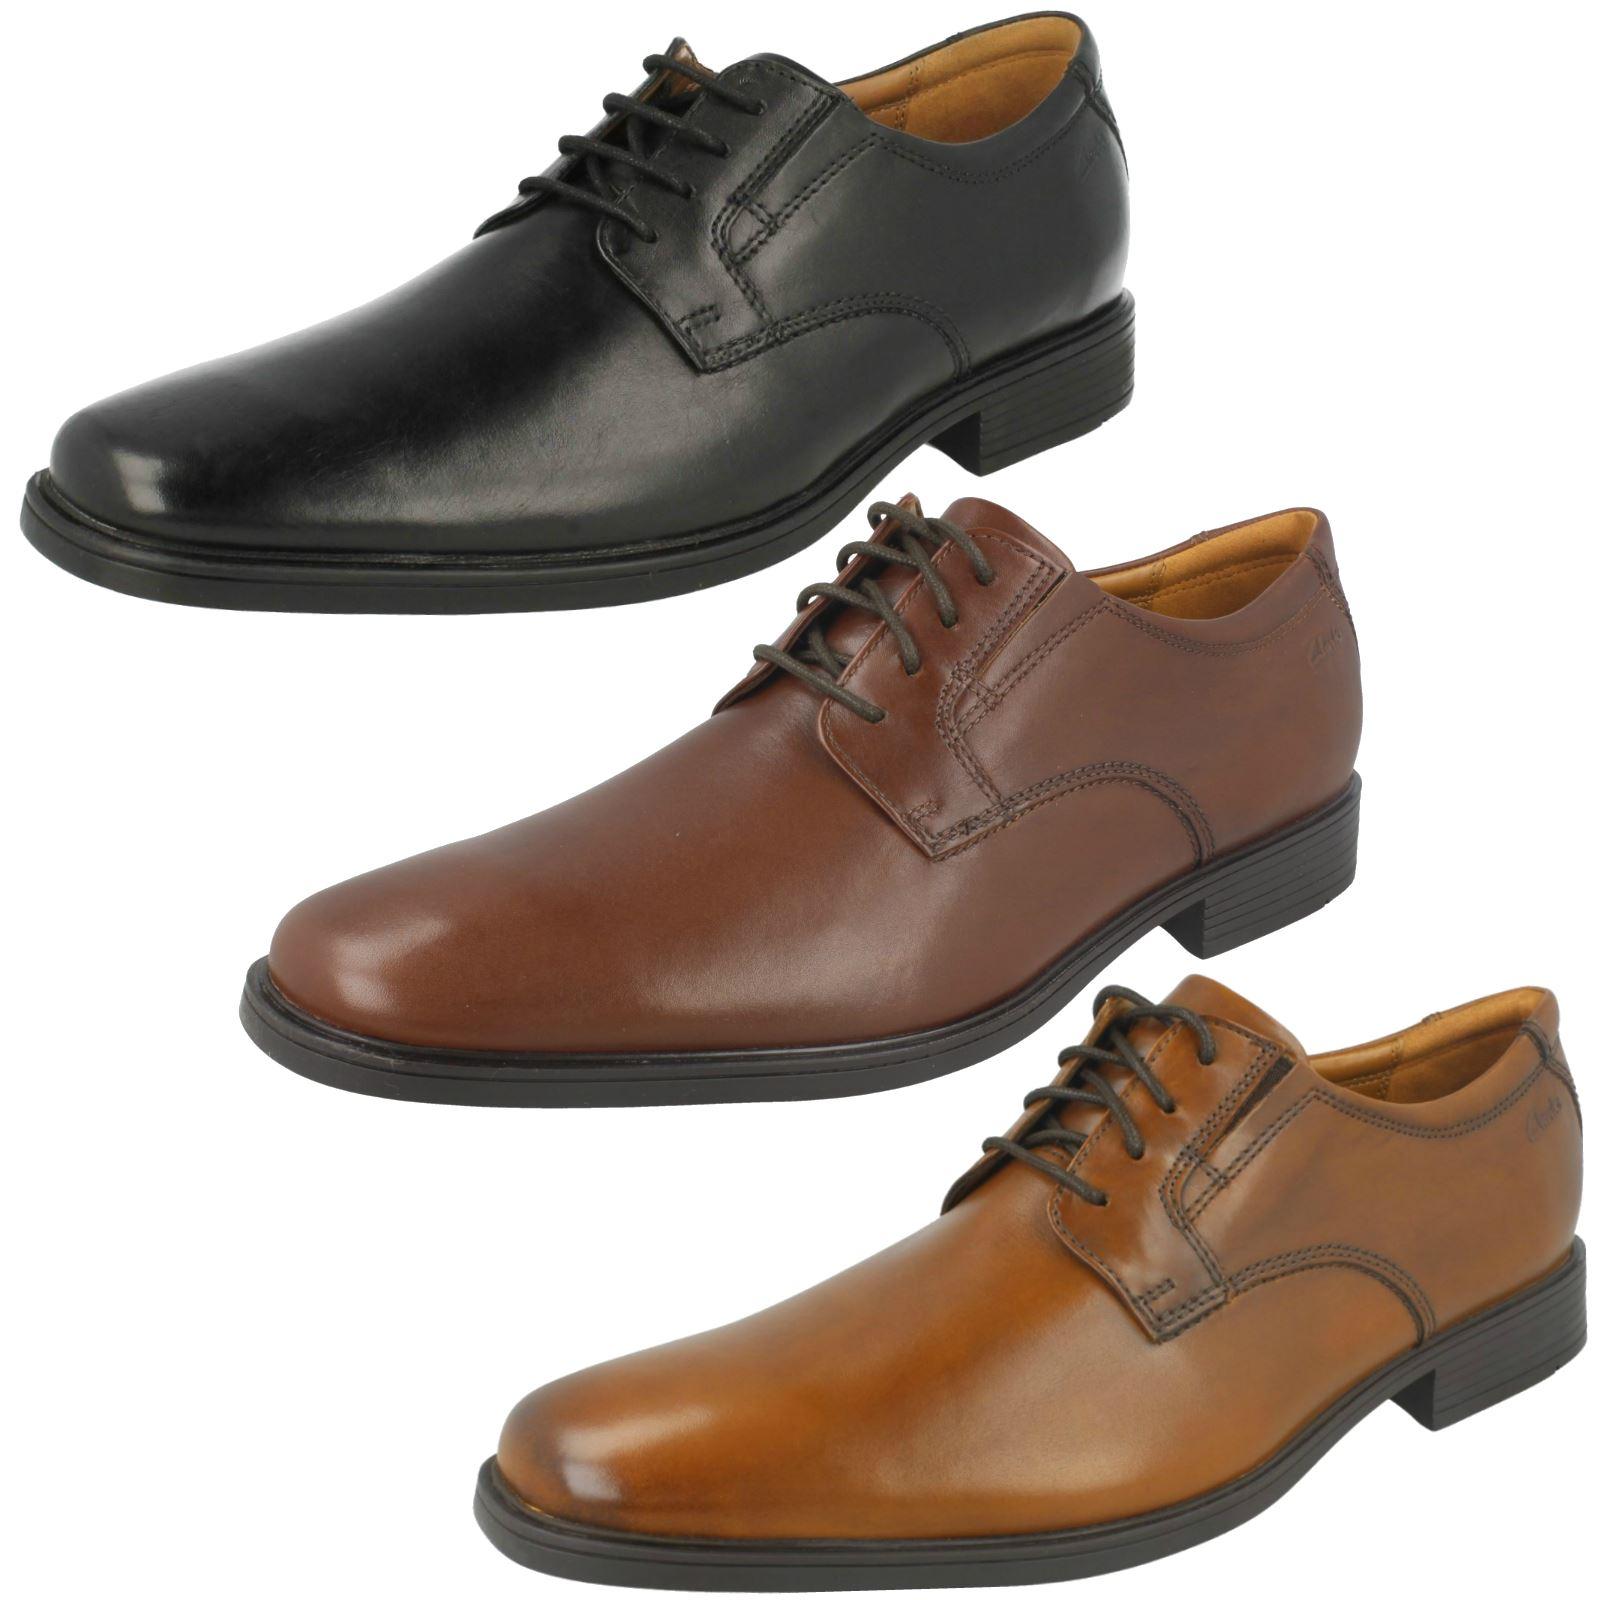 863f10b95b3b8 Details about Mens Clarks Tilden Plain Formal Shoes